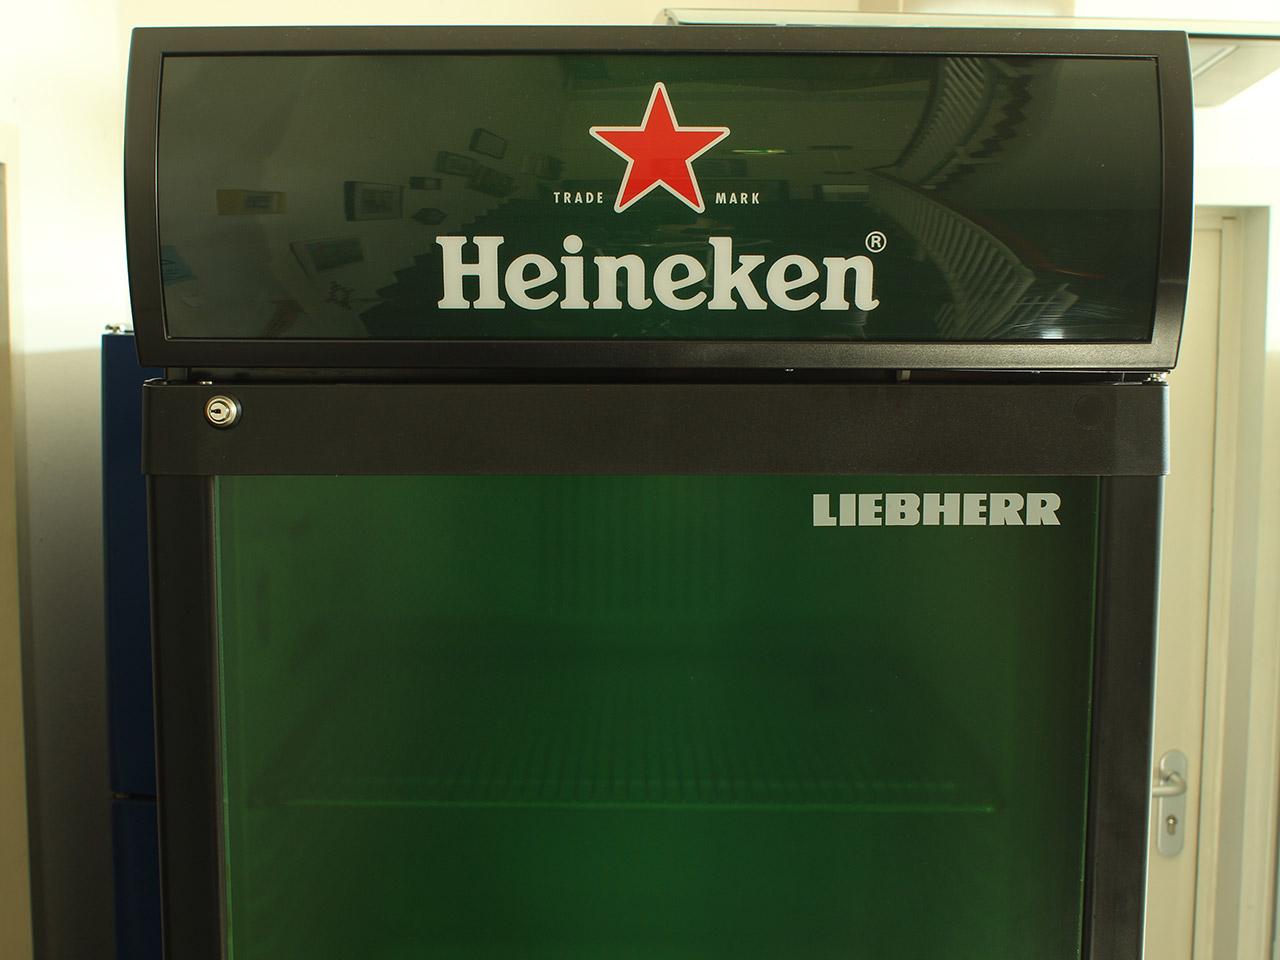 198 cm Liebherr FKDv 4313 Heineken Profi Gastro ...